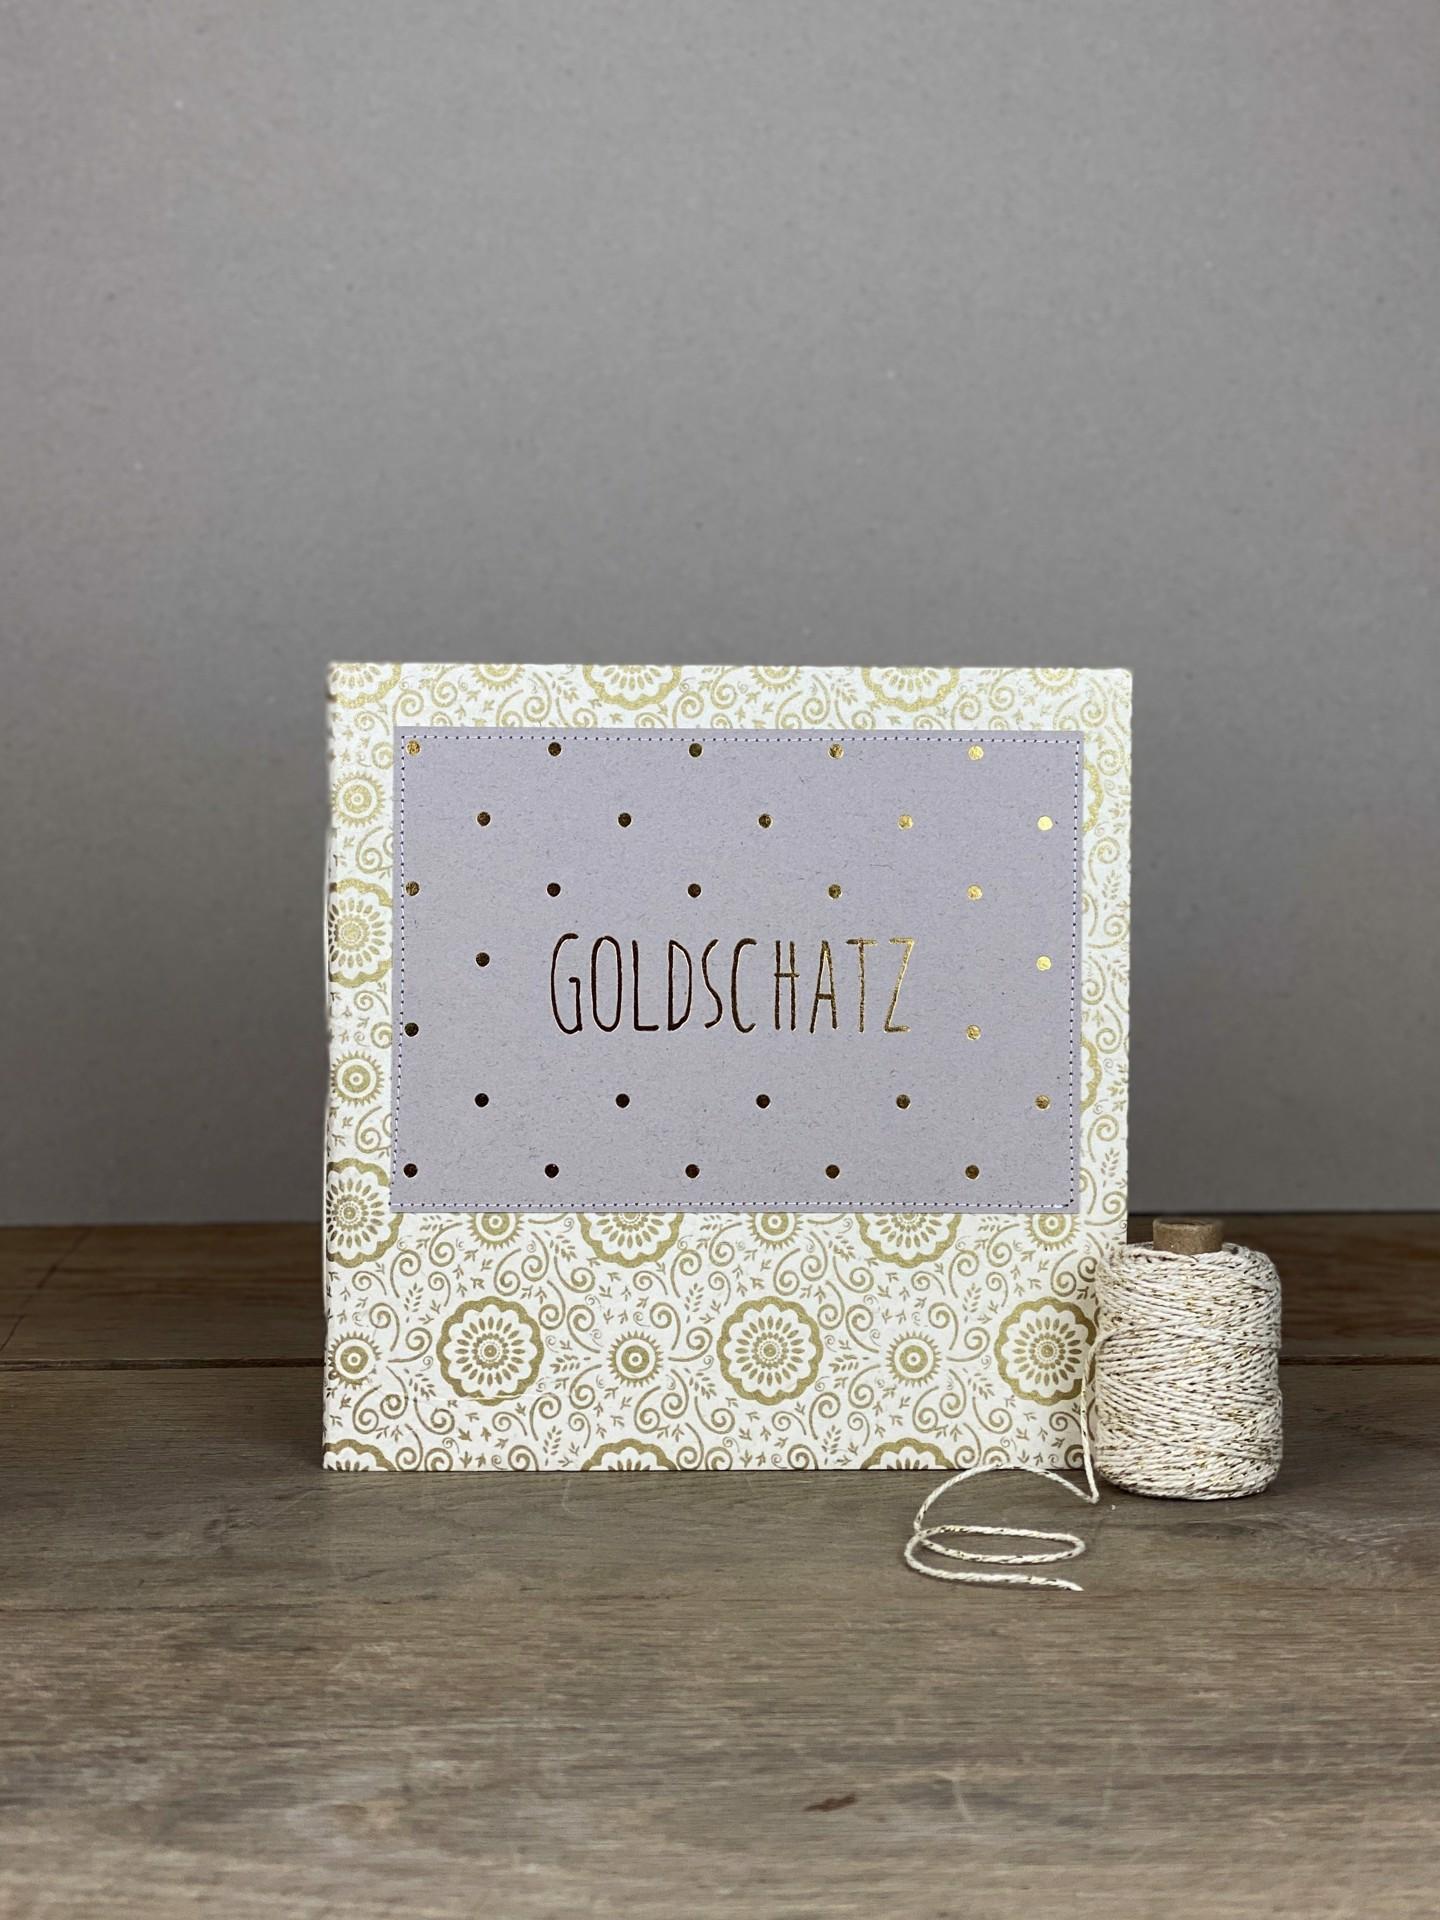 Album Softcover Quart Tag Goldschatz floral weiß/gold